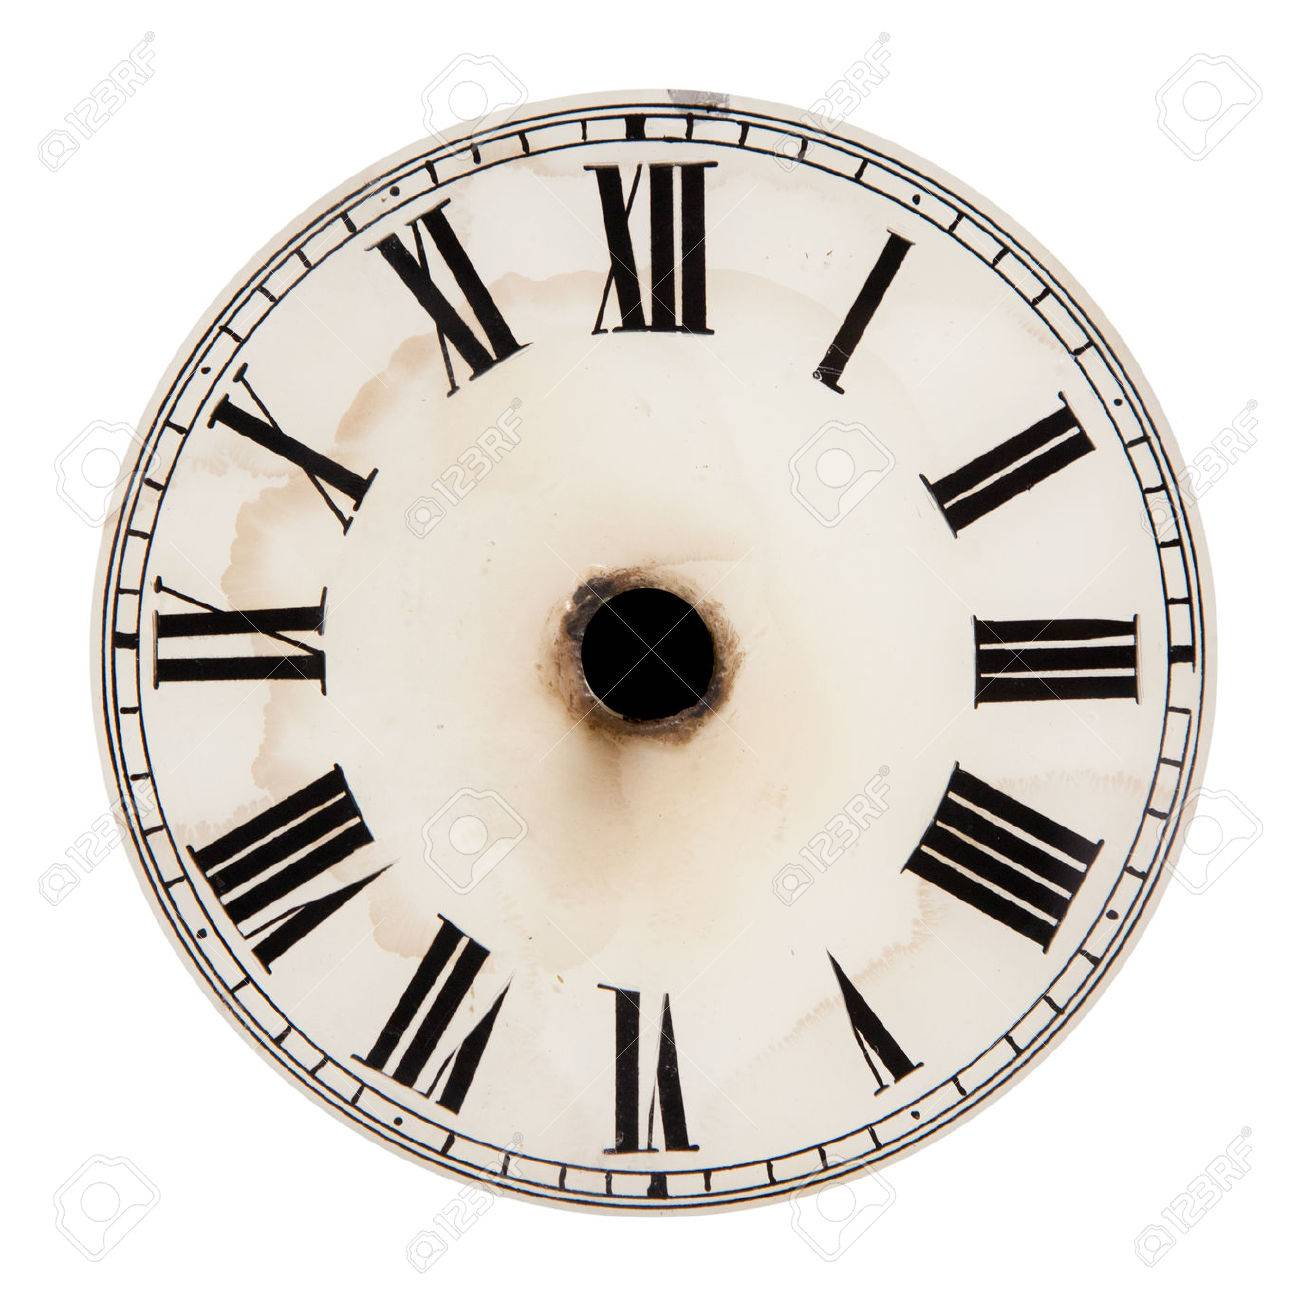 Wall Clocks Stock Photos Pictures Royalty Free Wall Clocks